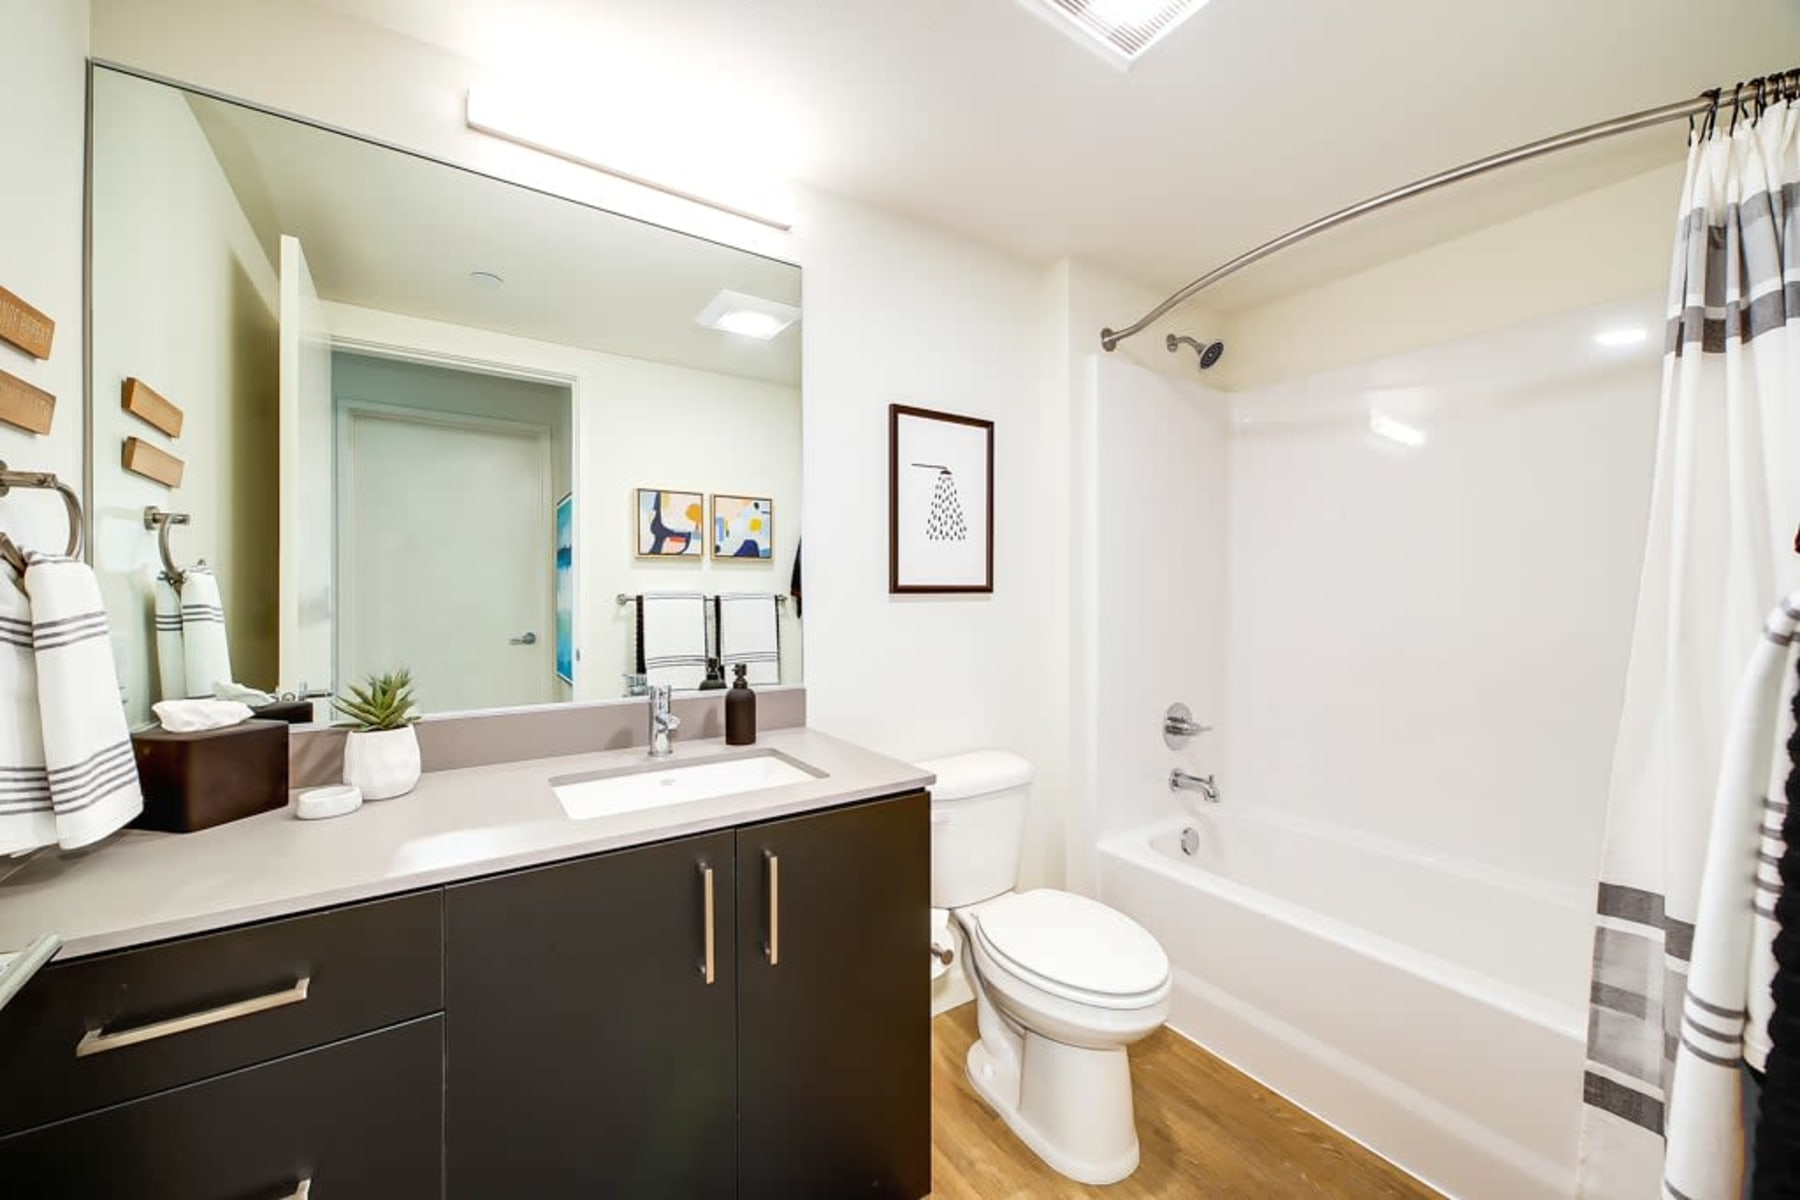 Bathroom at Blackbird in Redmond, Washington